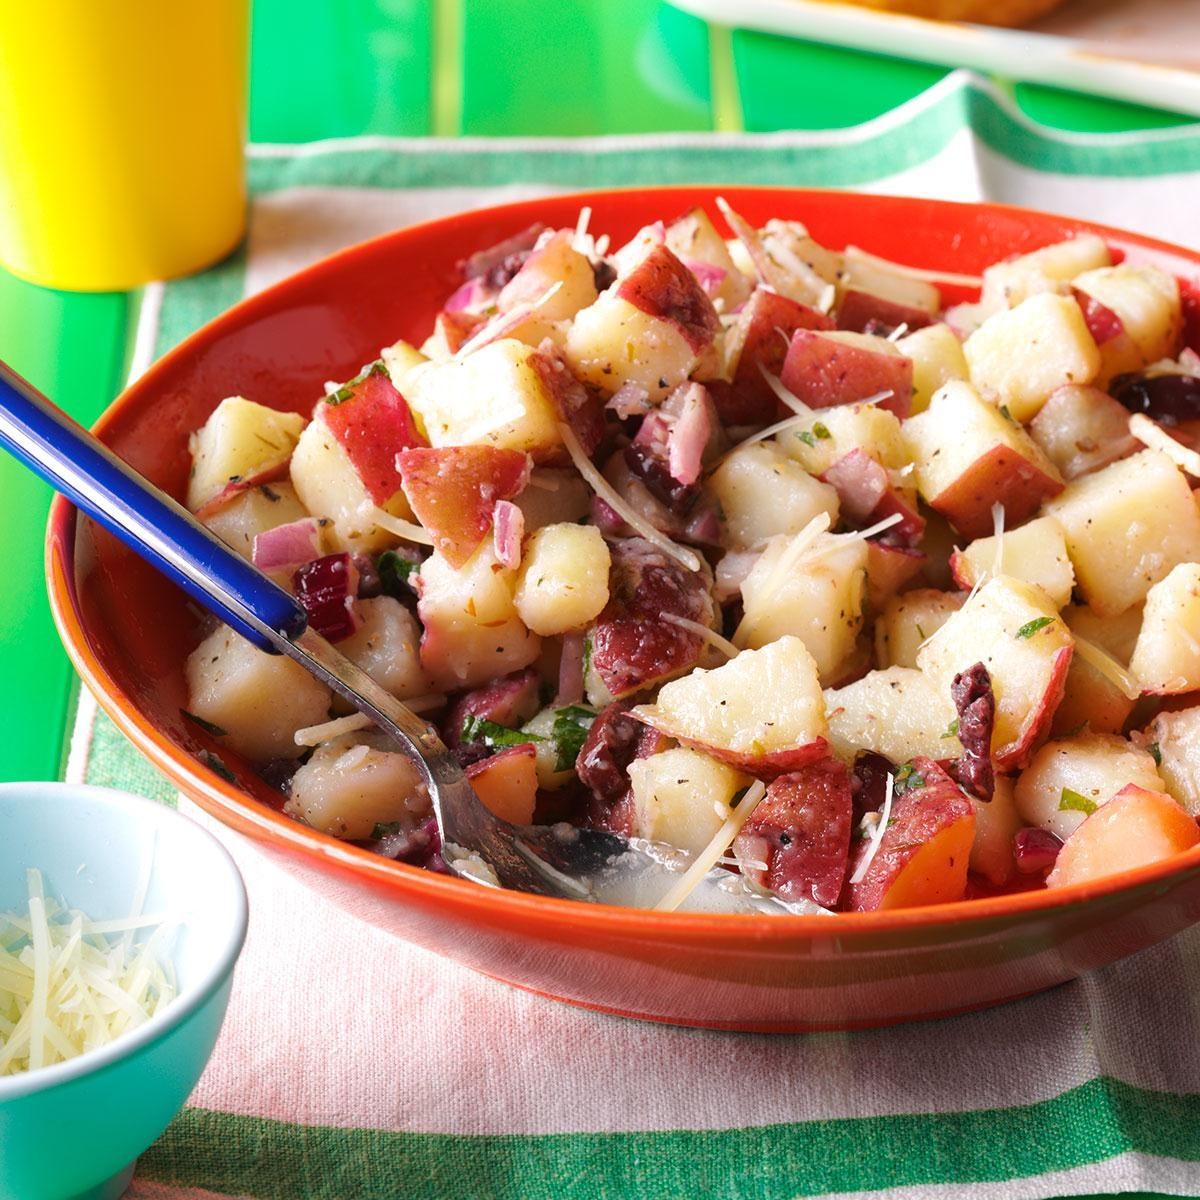 Red Potato Salad with Lemony Vinaigrette